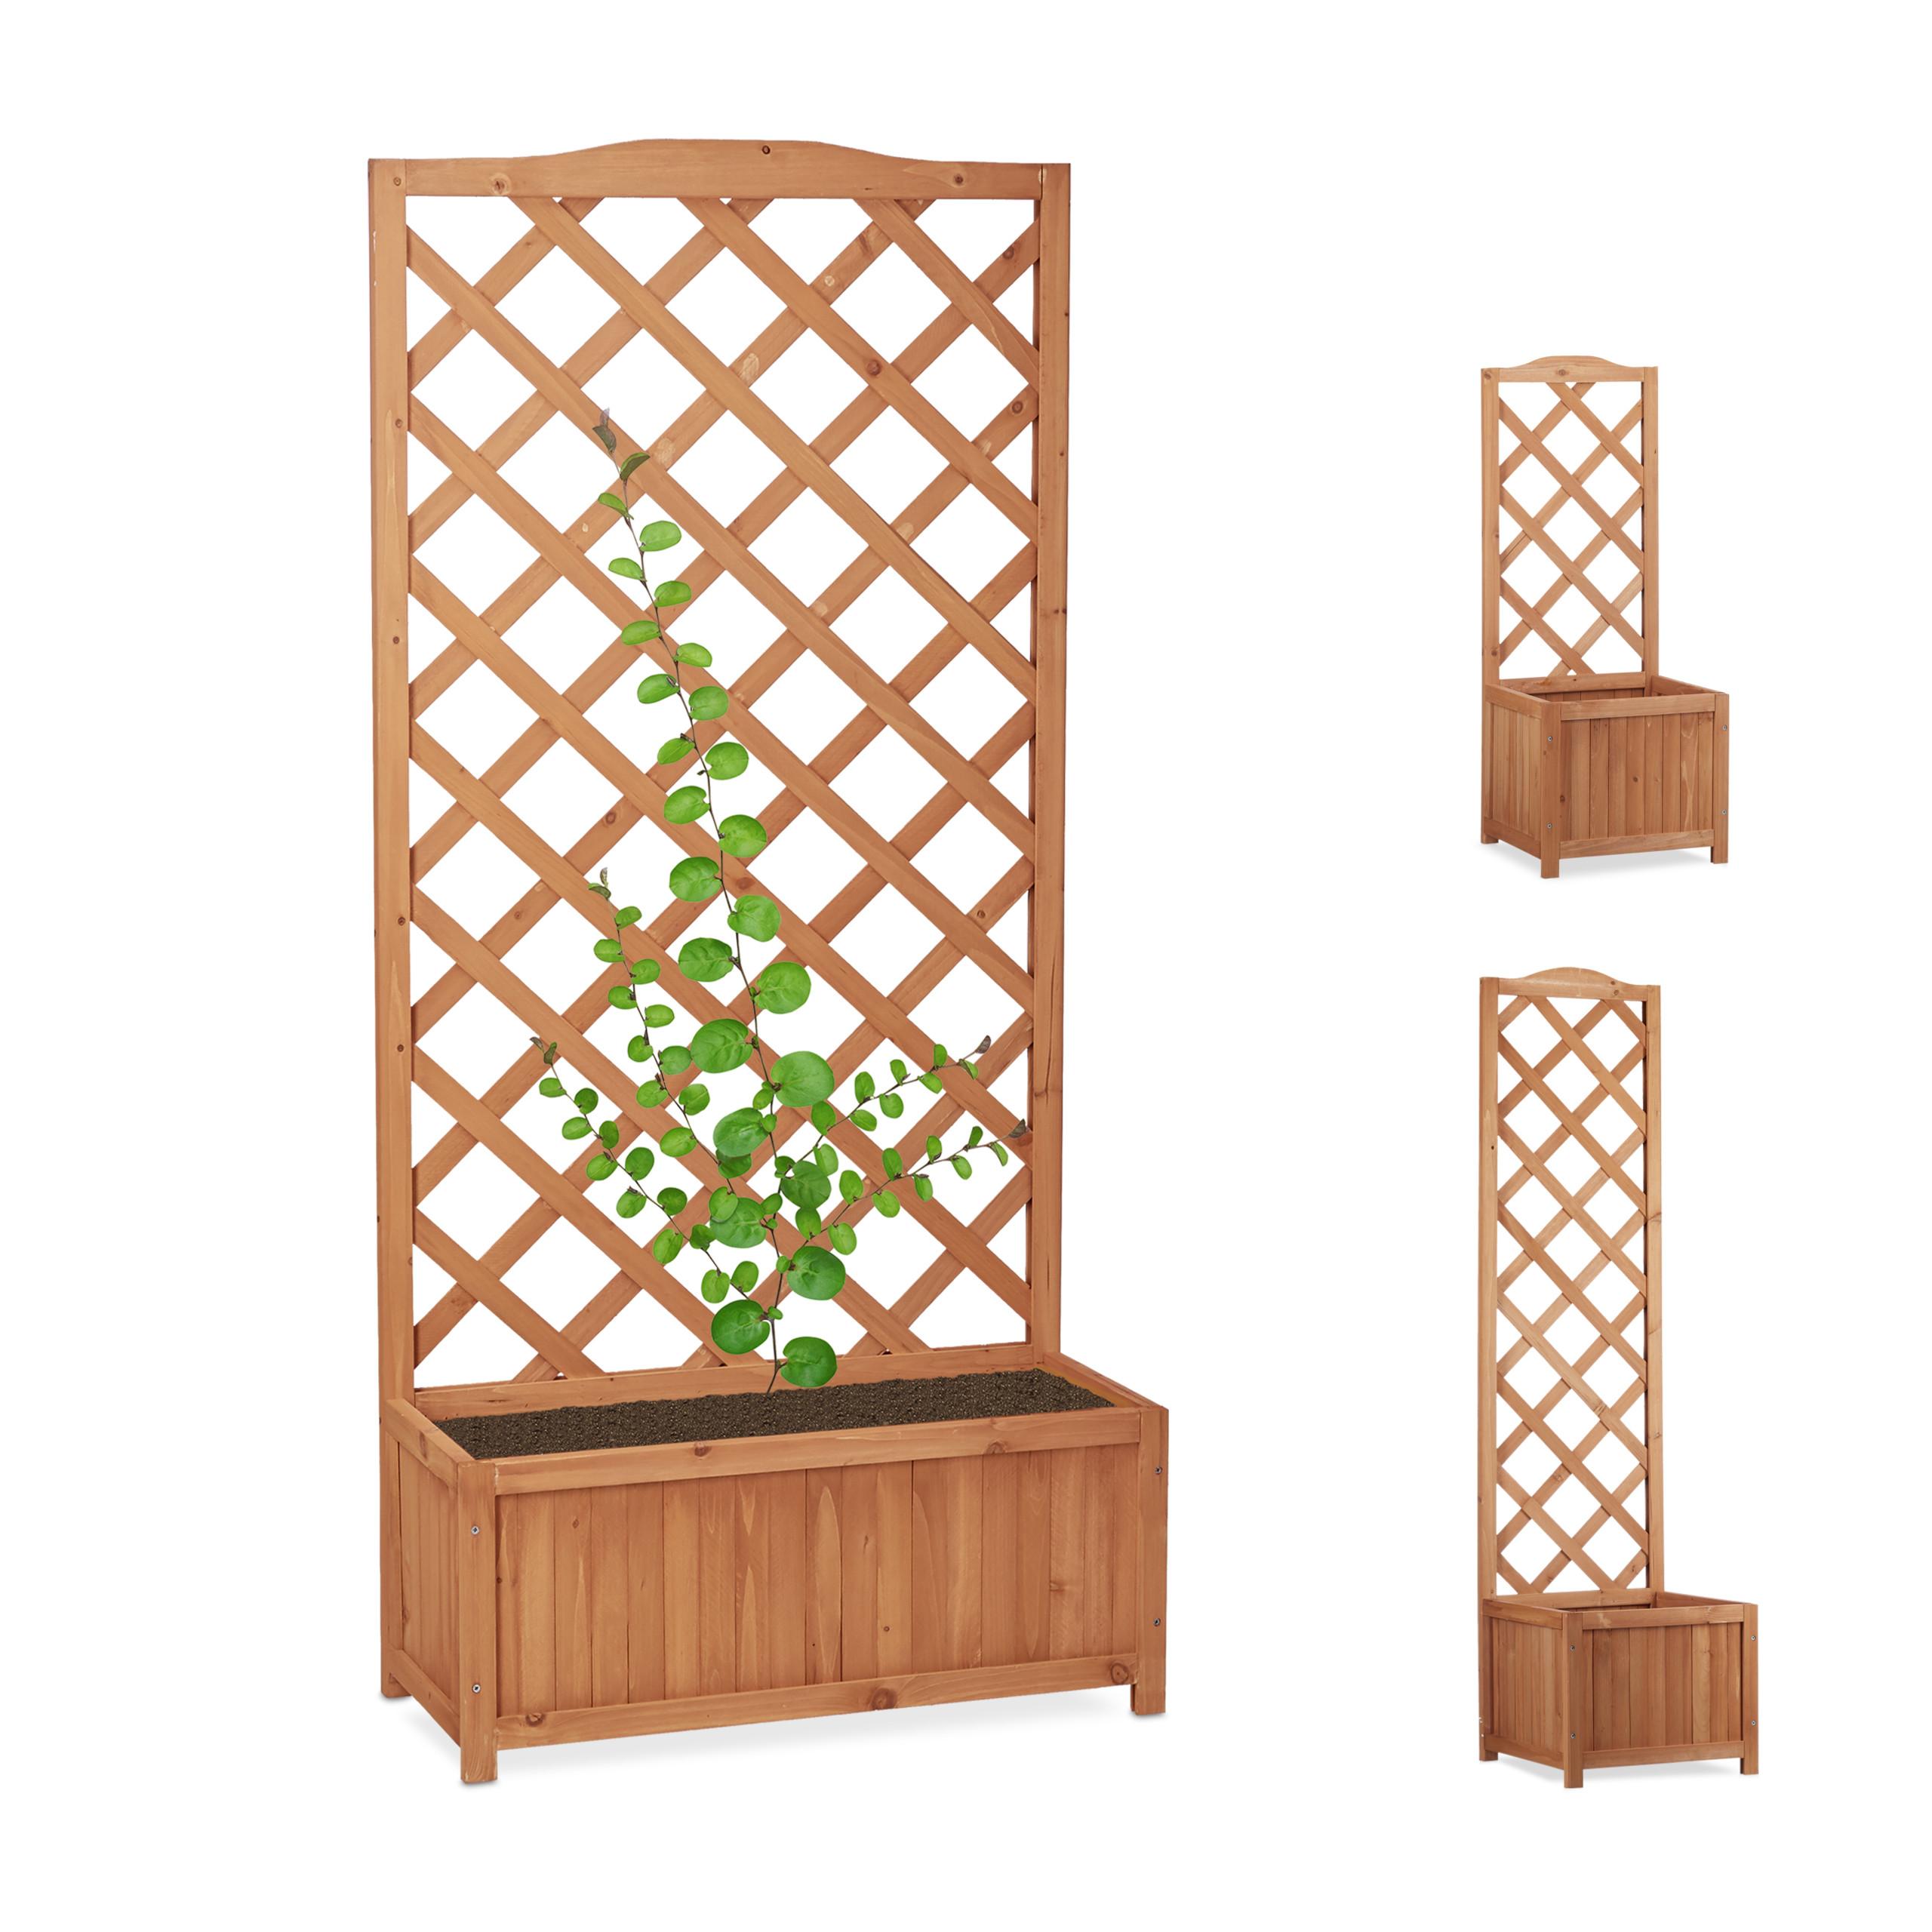 Outdoor Planter Box With Trellis Weatherproof Lattice Flower Pot